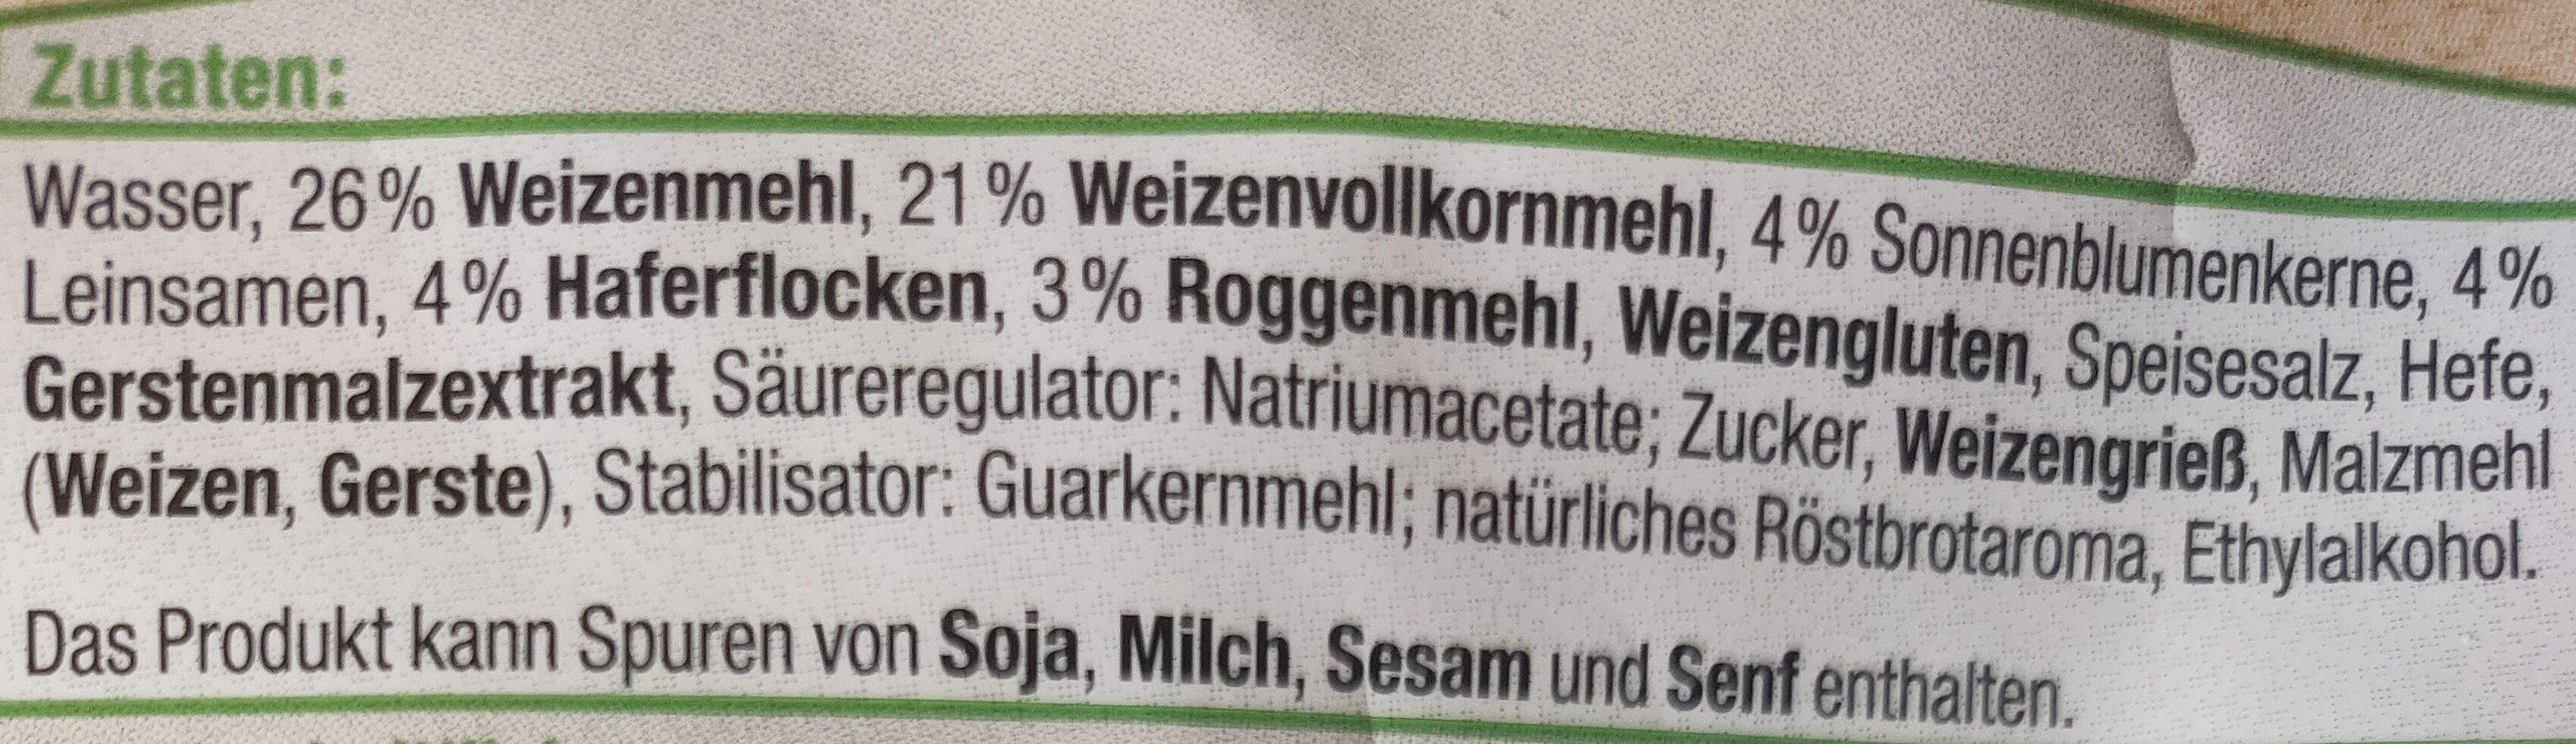 Mehrkornbrötchen - Ingrediënten - de